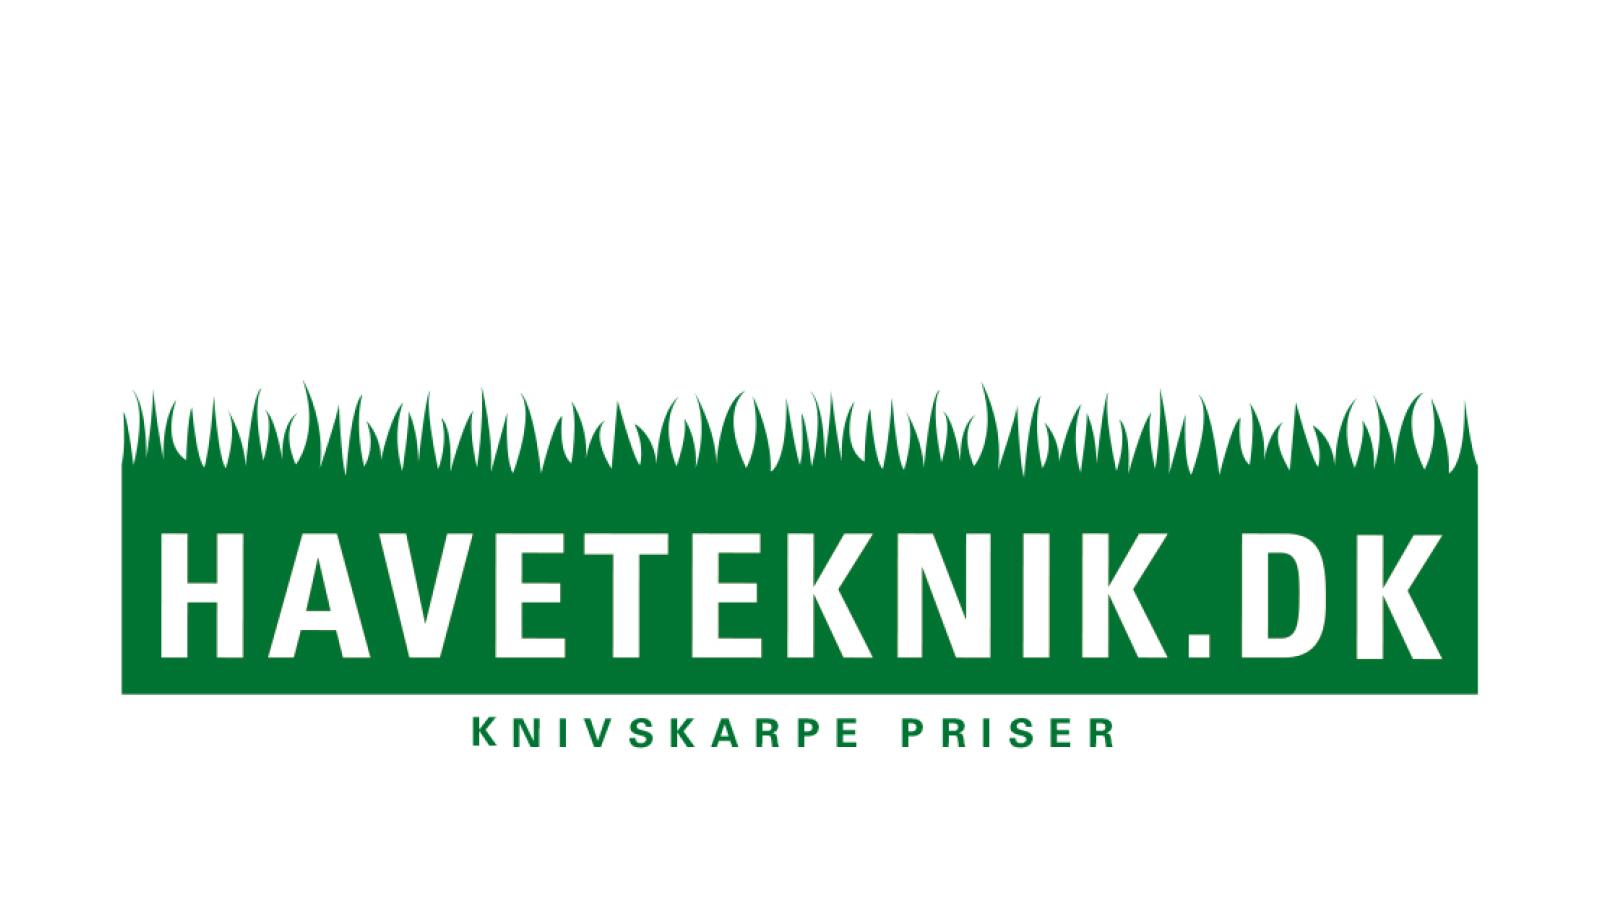 Haveteknik_logo_1600x900